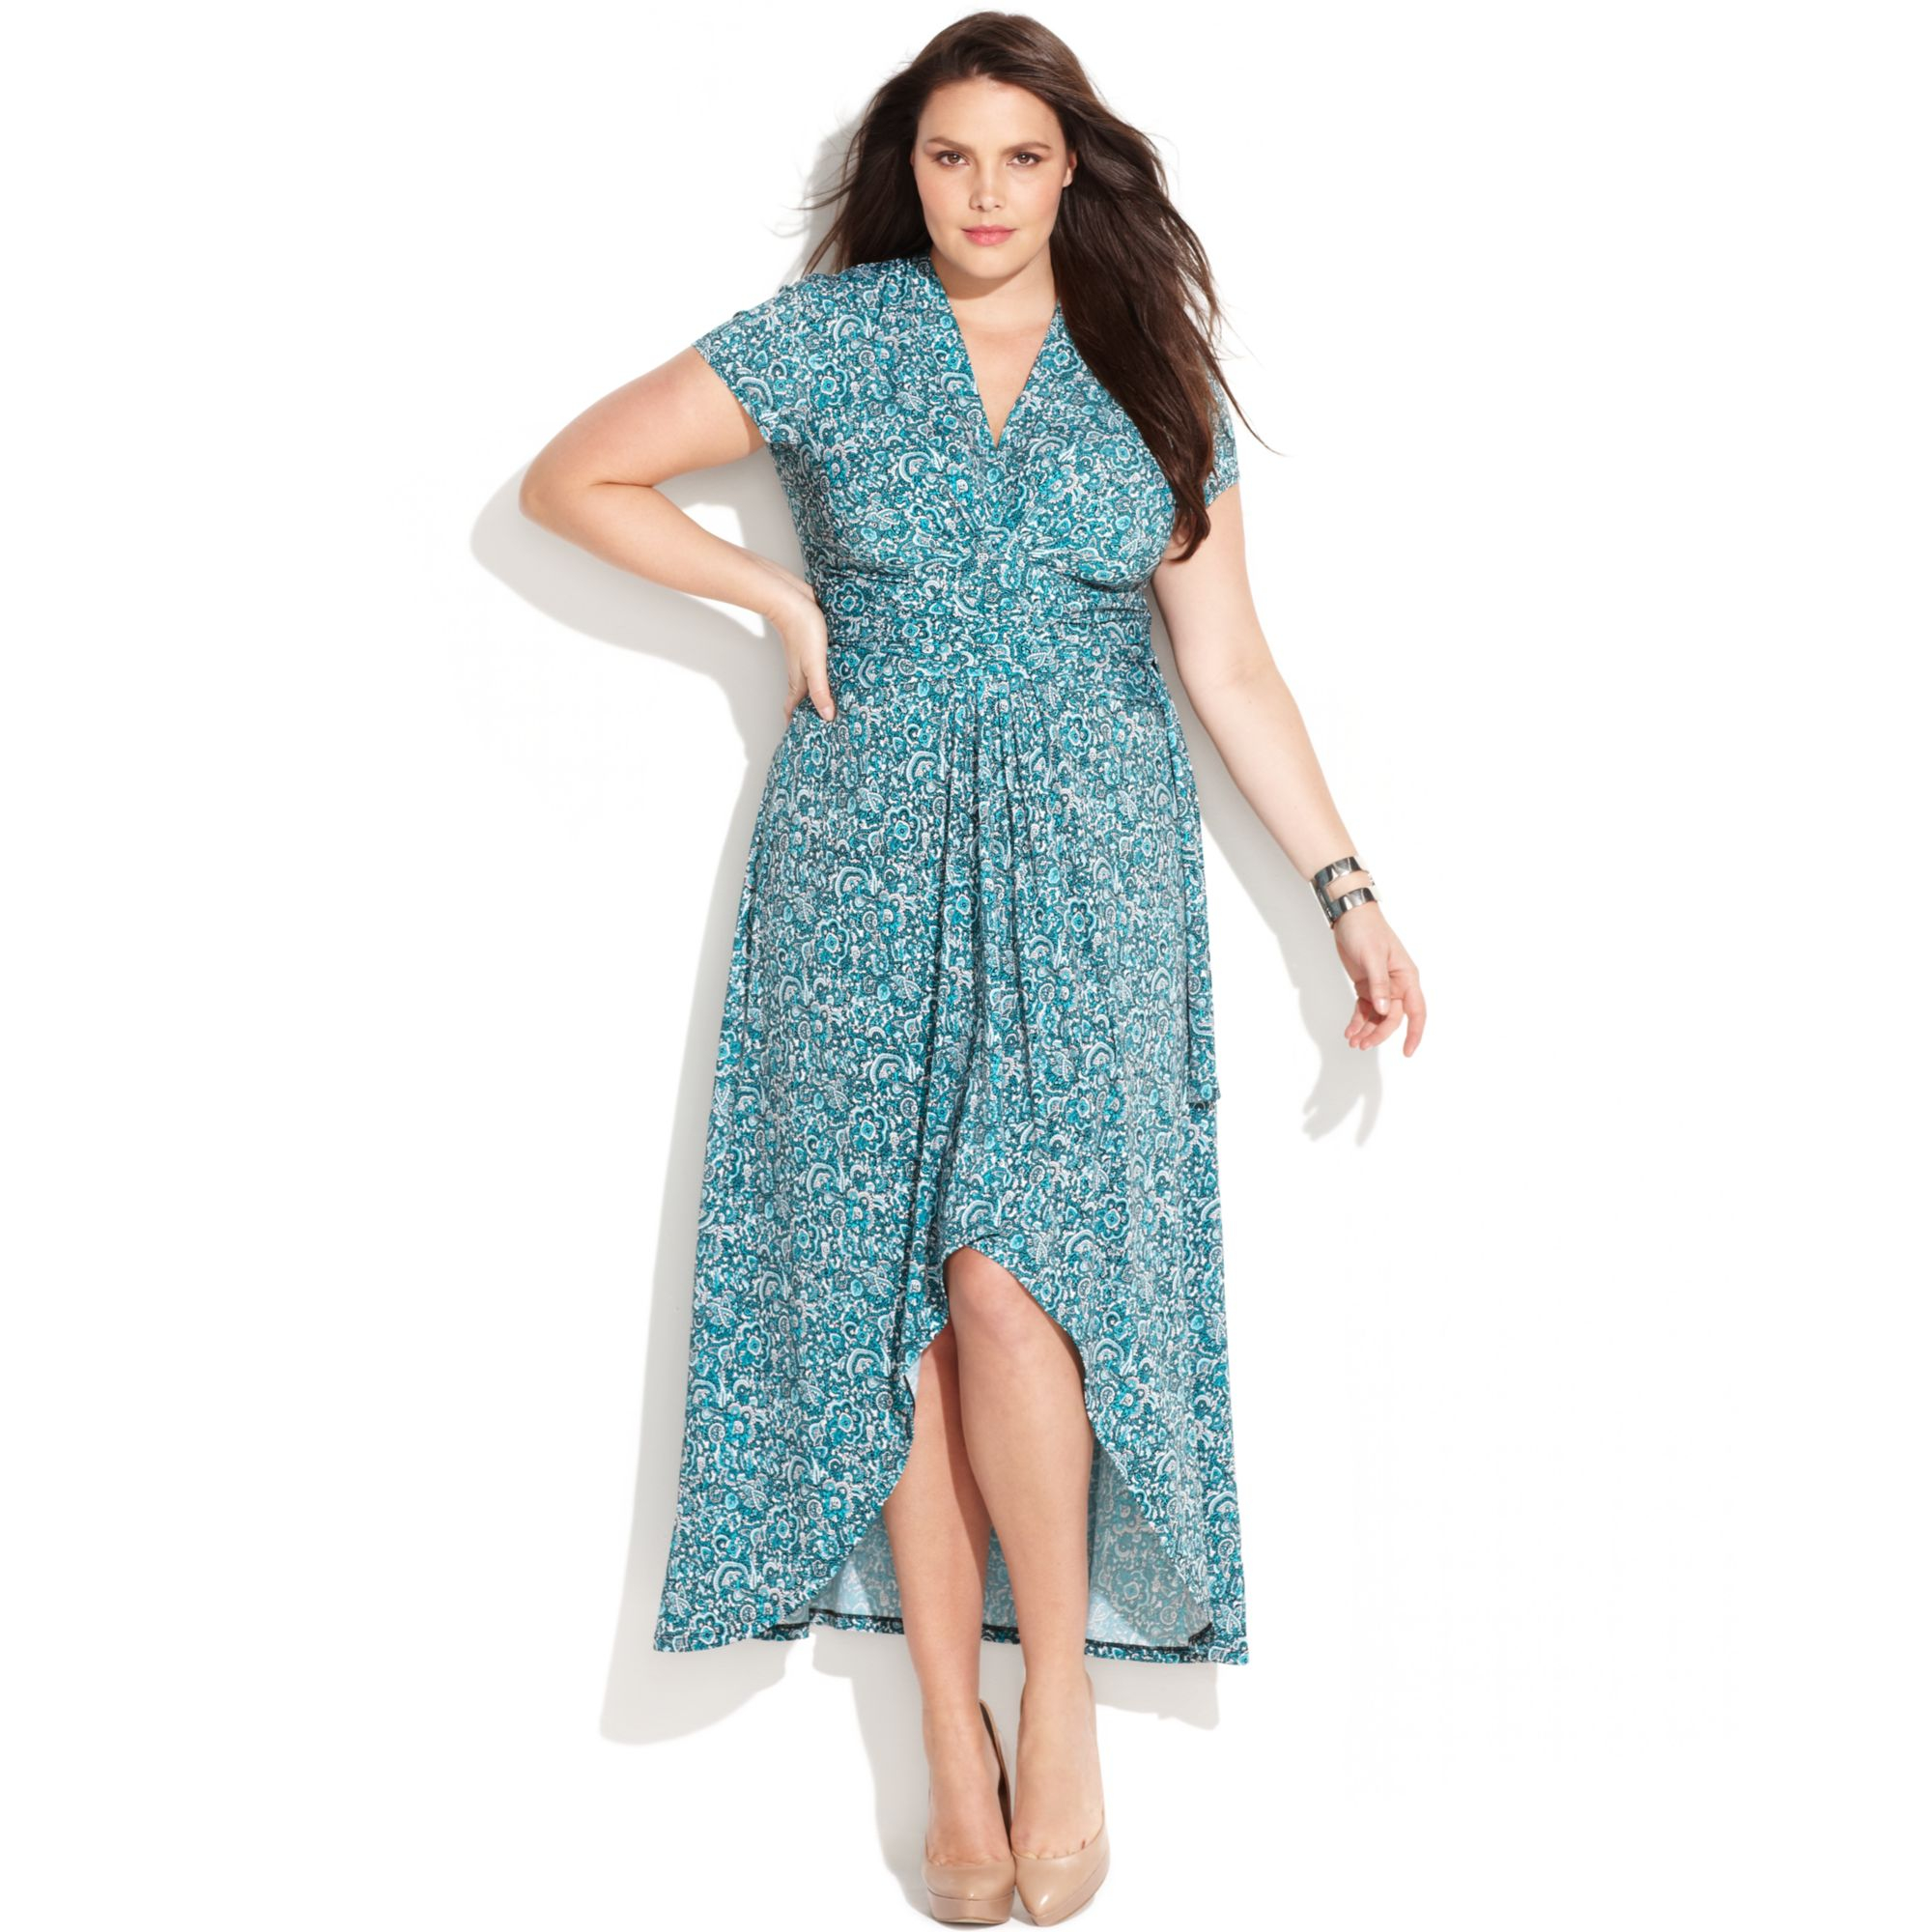 Michael Kors Plus Size Printed Faux Wrap Maxi Dress in Blue - Lyst